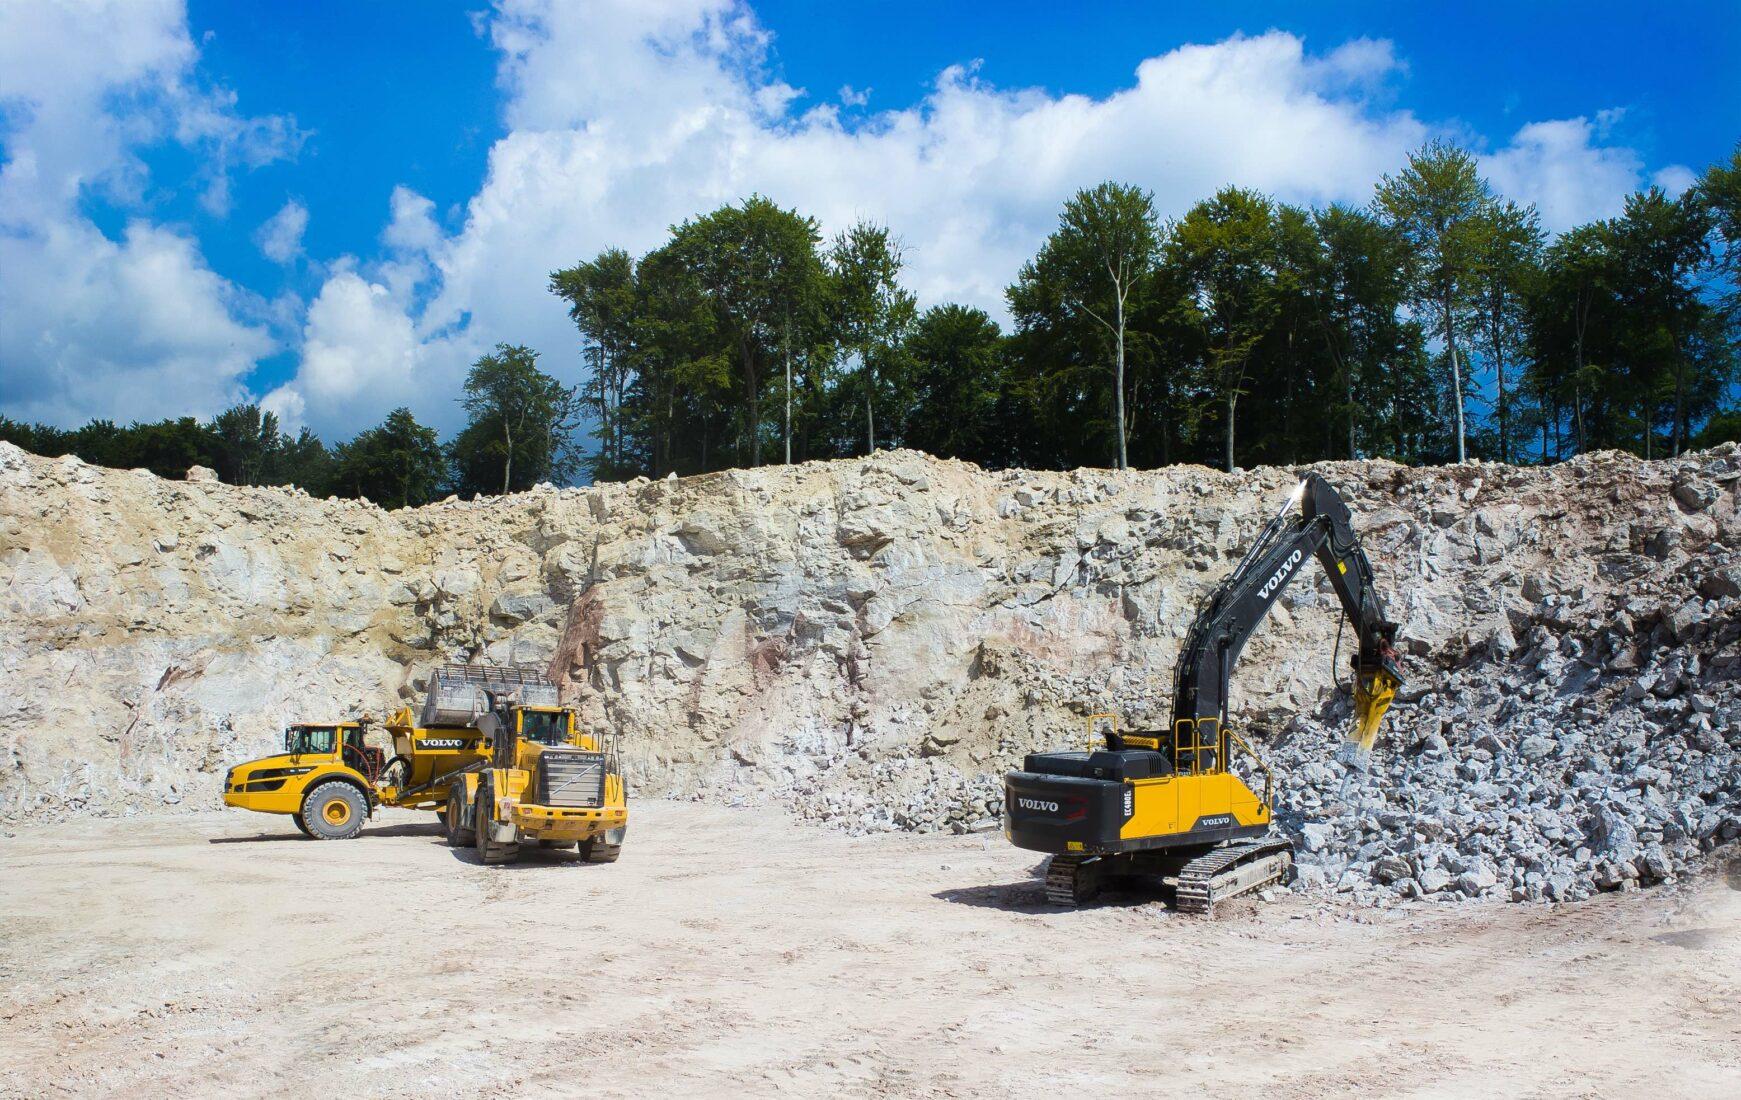 Die Lücke beim REA-Gips muss durch verstärkten Naturgipsabbau geschlossen werden. Foto: BV Gips